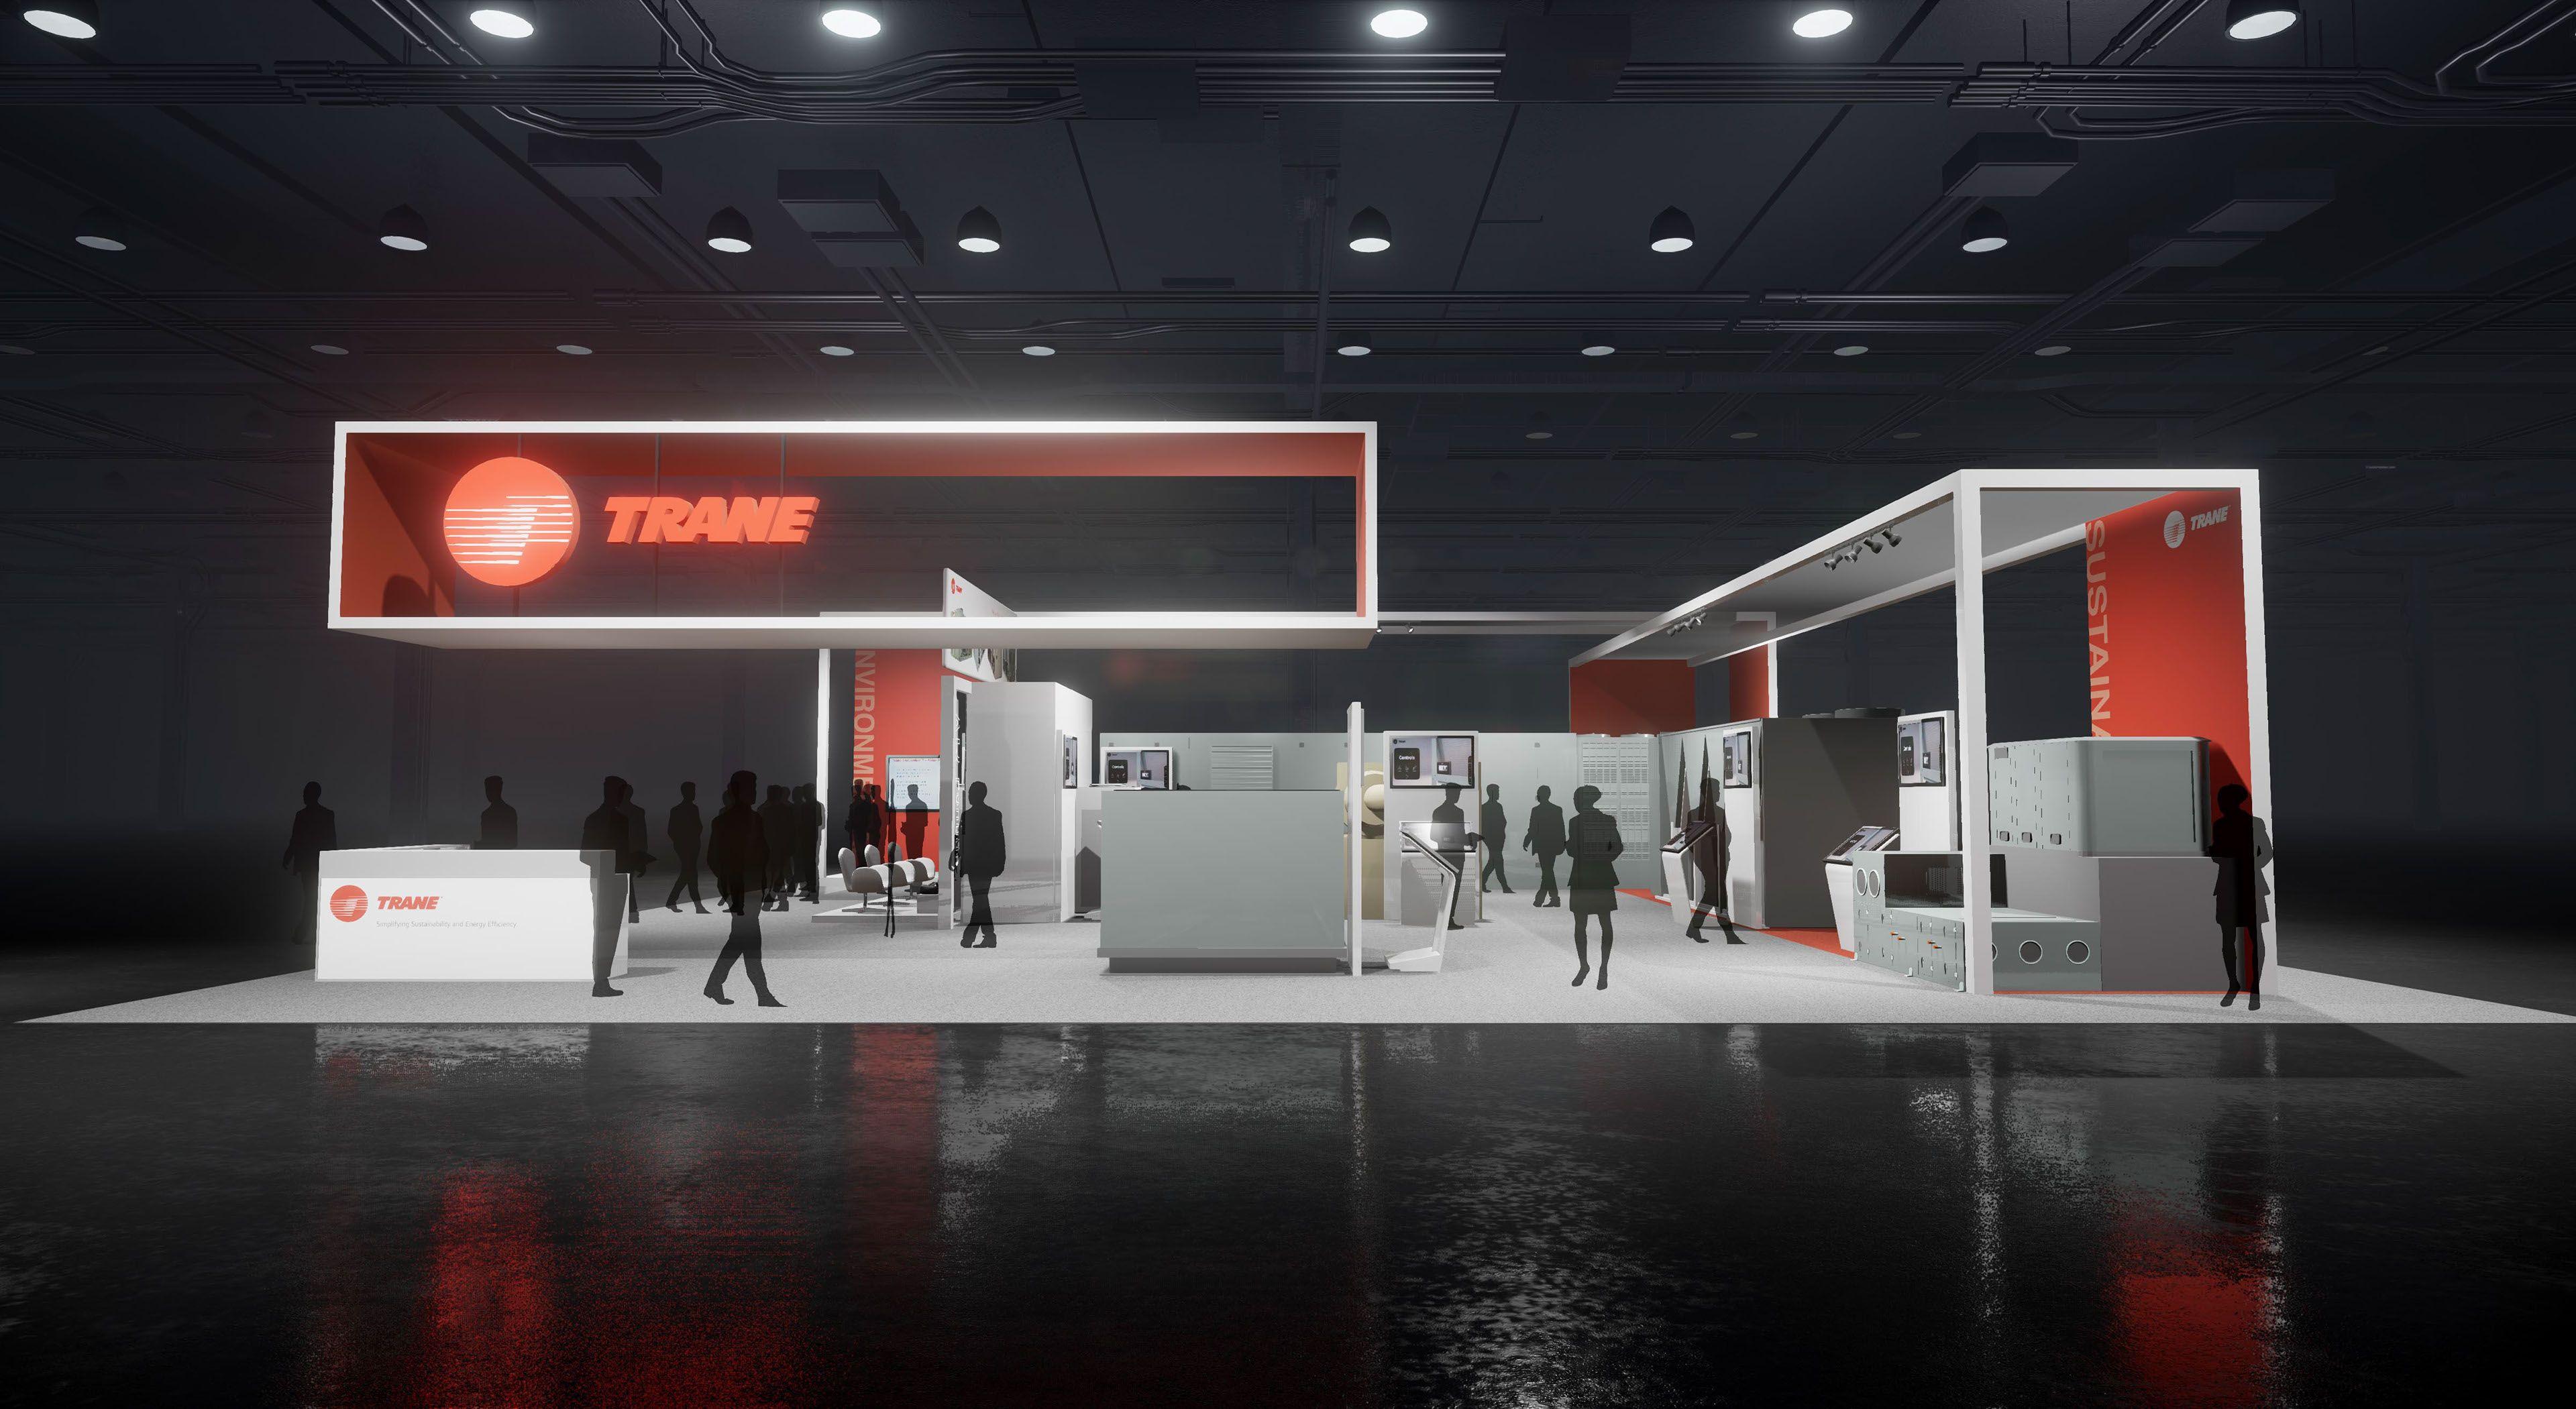 Exhibition Booth Header : Trane exhibit design on behance temporary exhibition